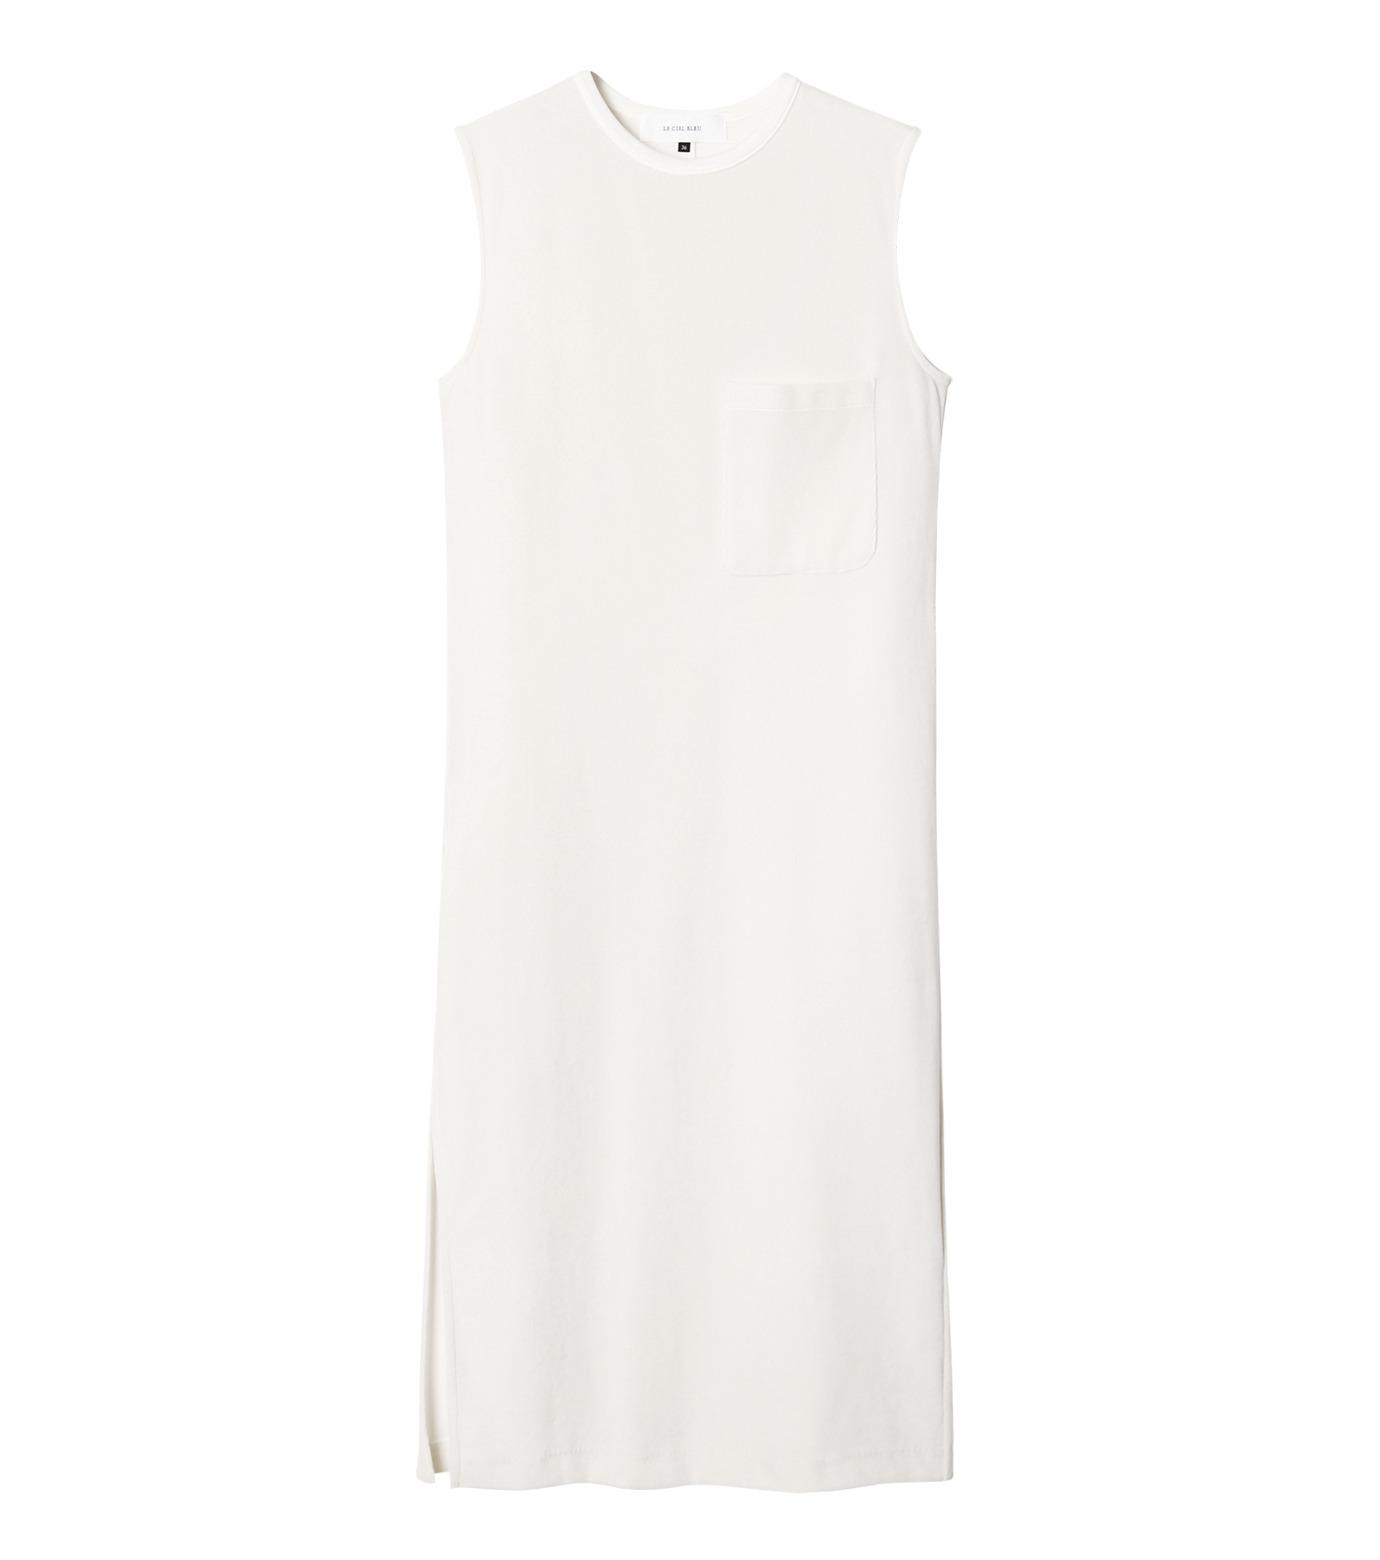 LE CIEL BLEU(ルシェルブルー)のベロアチュニックドレス-WHITE(トップス/tops)-19S62102 拡大詳細画像1